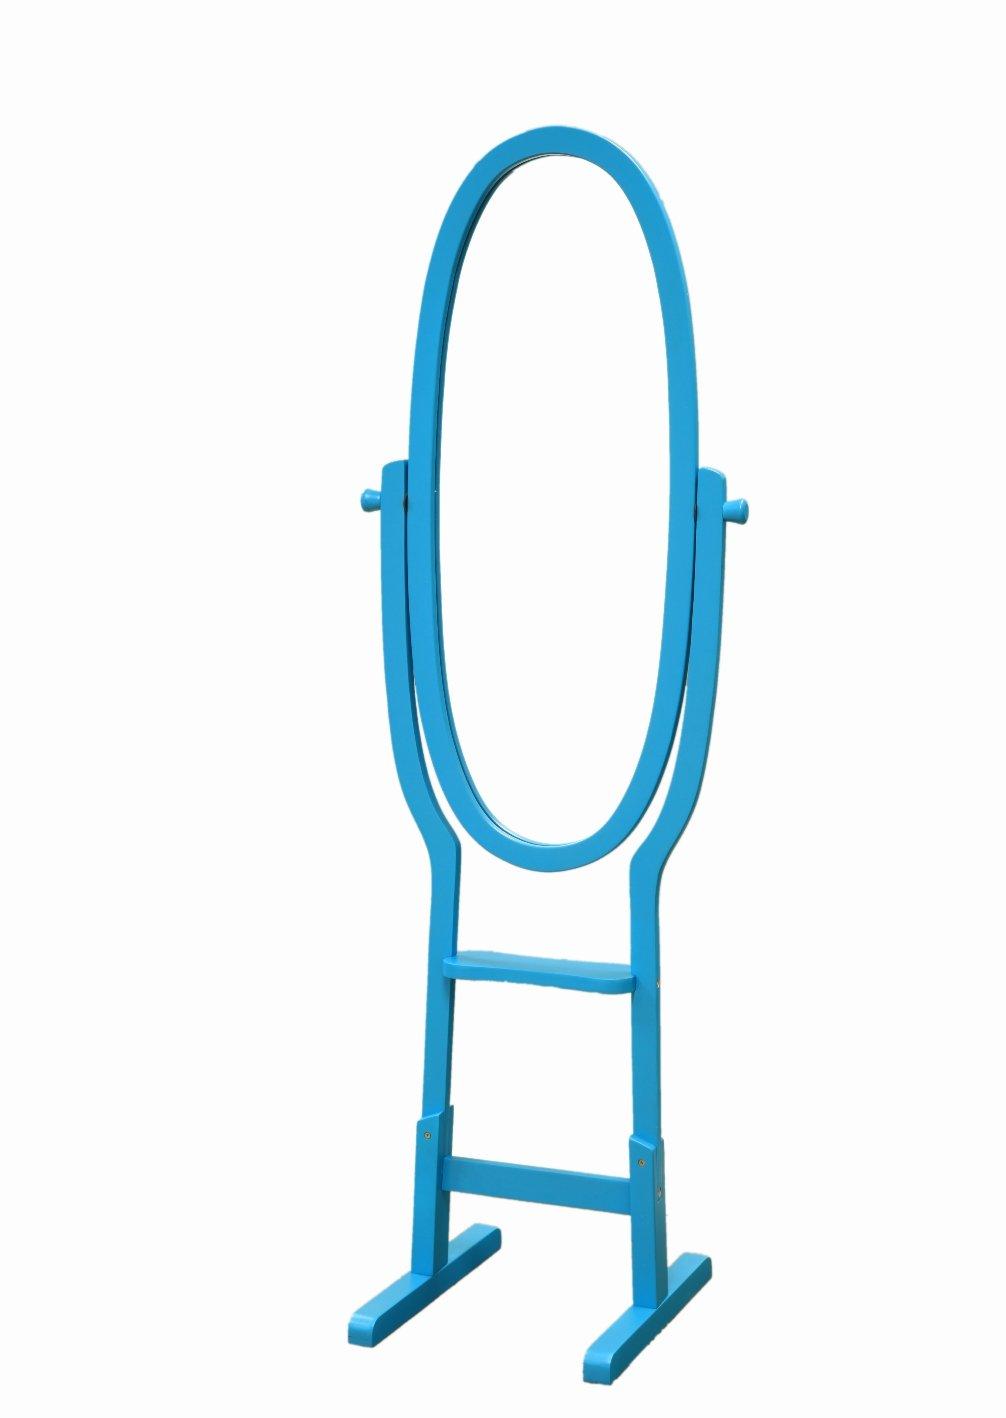 Frenchi Home Furnishing Kid's Mirror Stand, Blue